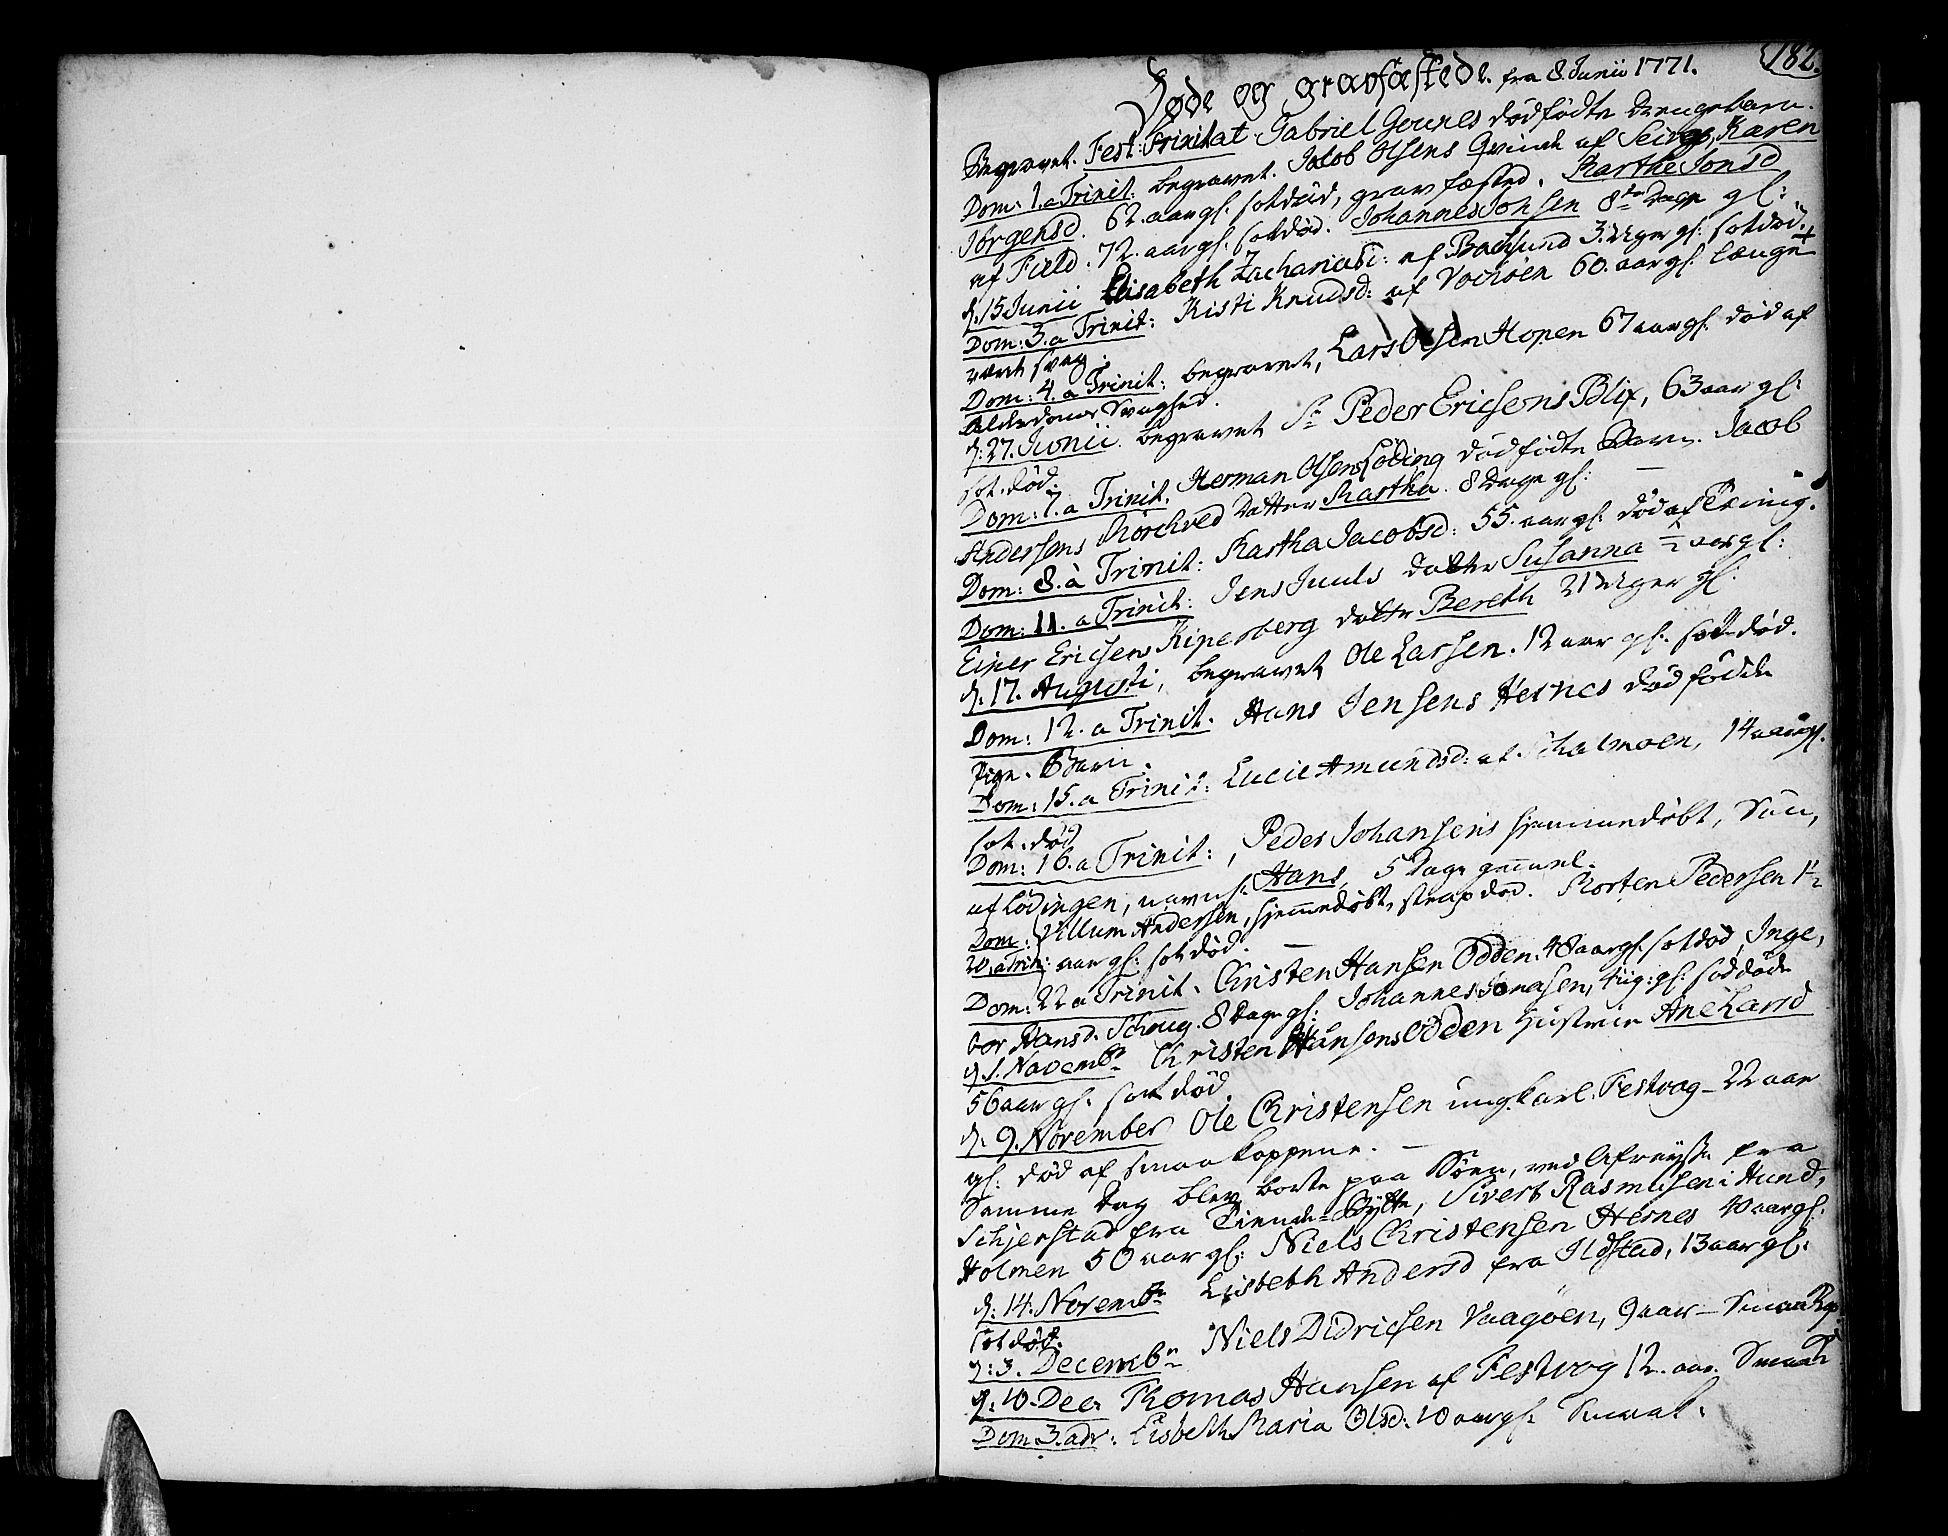 SAT, Ministerialprotokoller, klokkerbøker og fødselsregistre - Nordland, 801/L0003: Ministerialbok nr. 801A03, 1762-1795, s. 182